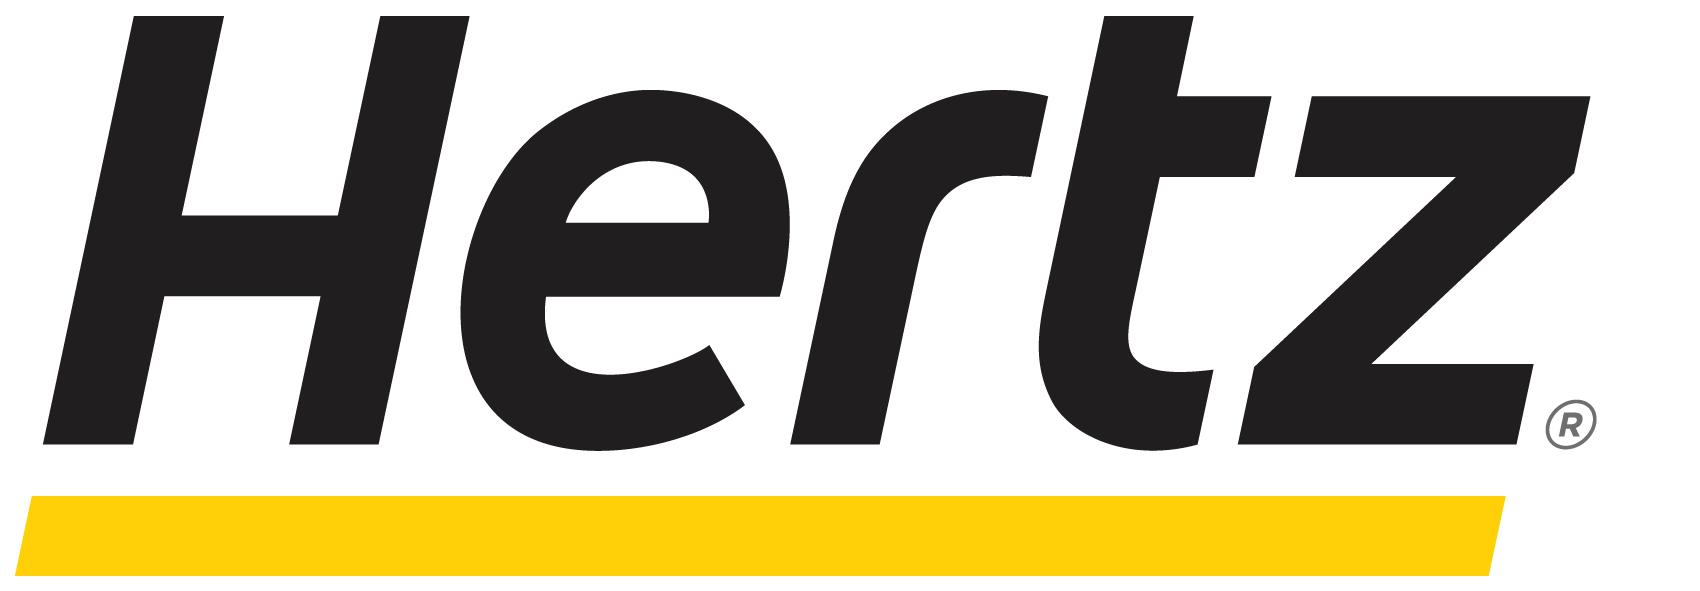 The Hertz Corporation - Wikipedia